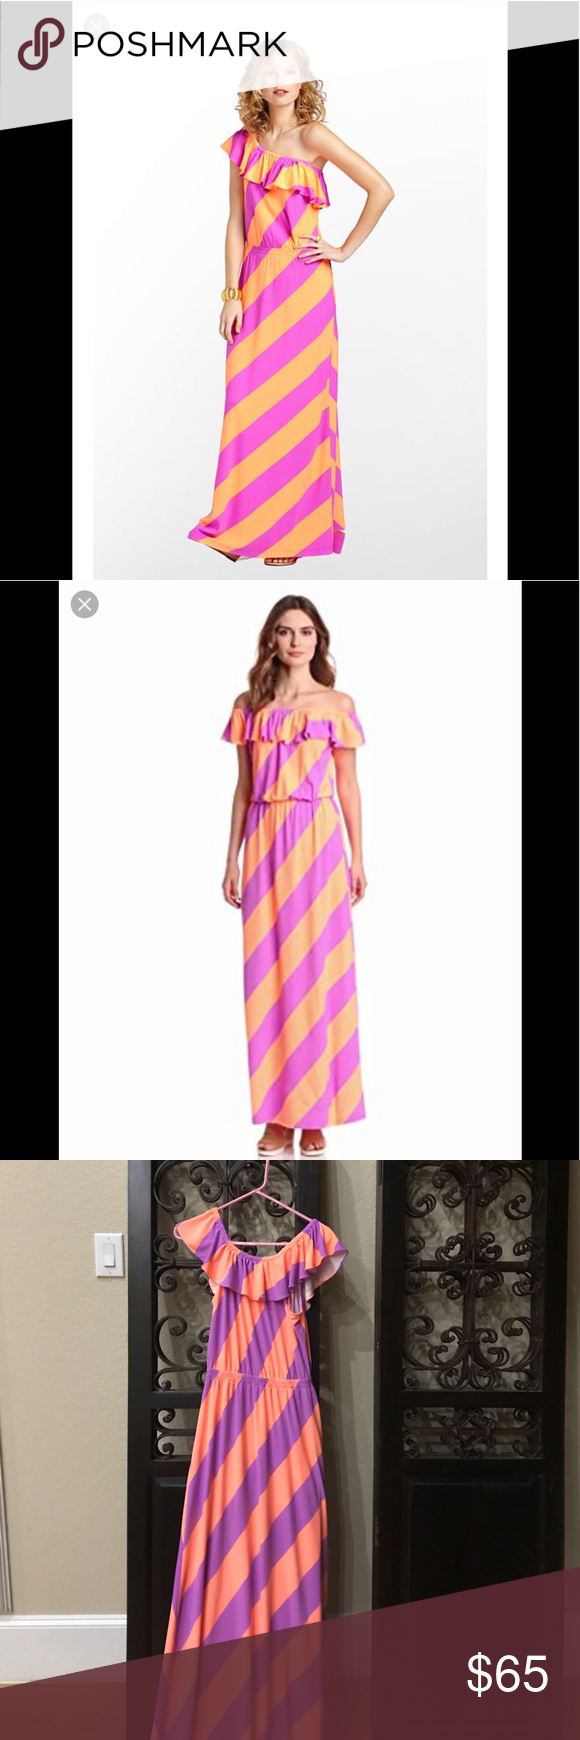 Lily Pulitzer Marley Maxi Dress